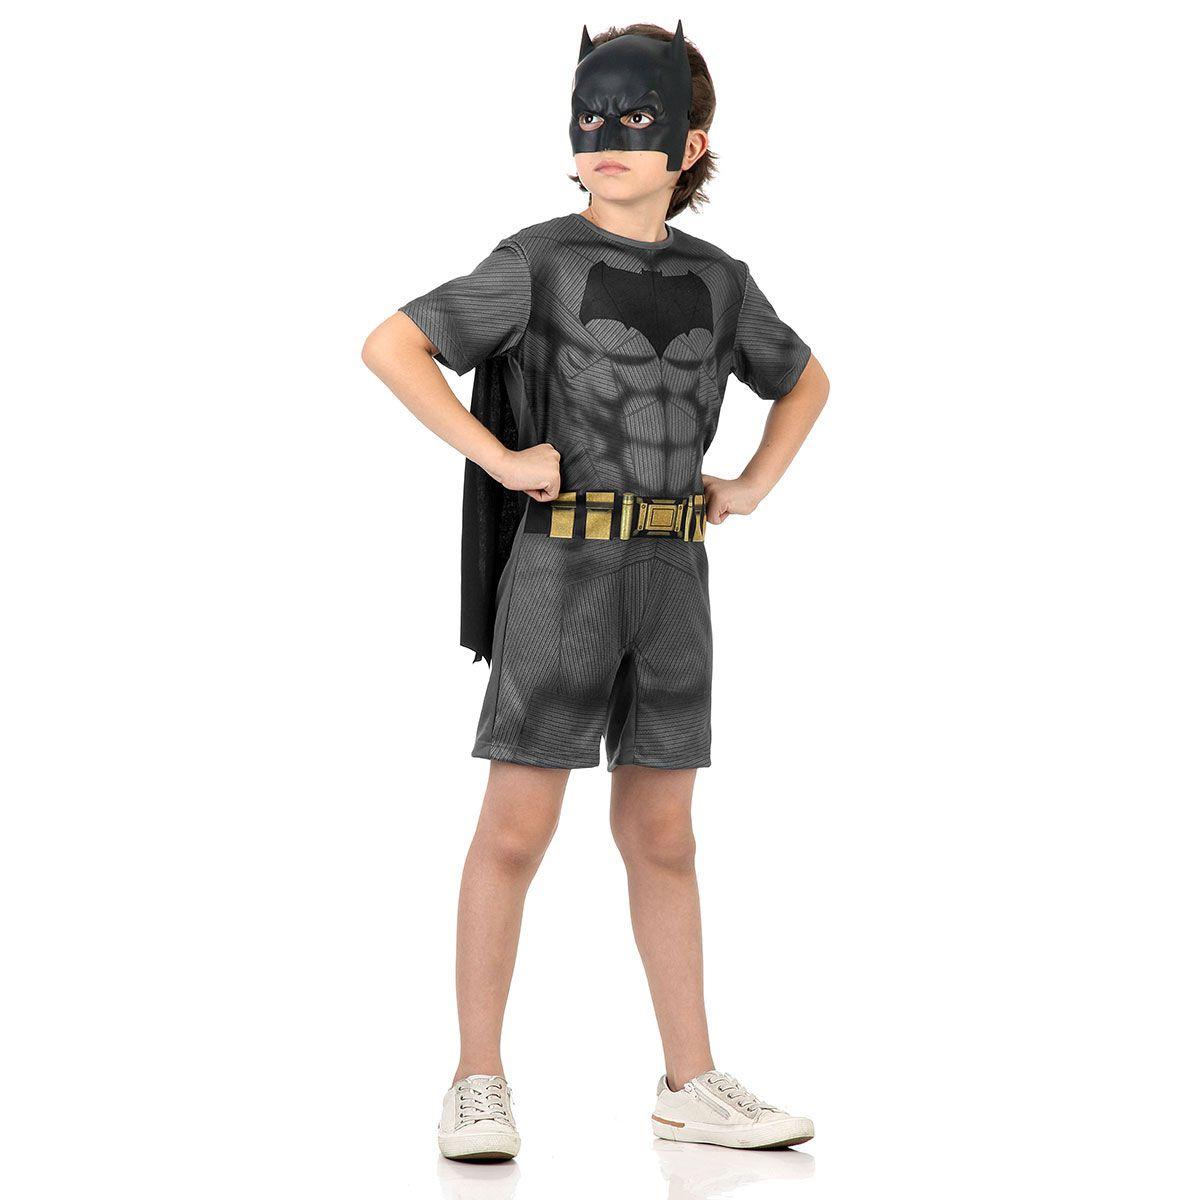 Fantasia Batman Curto com Musculatura